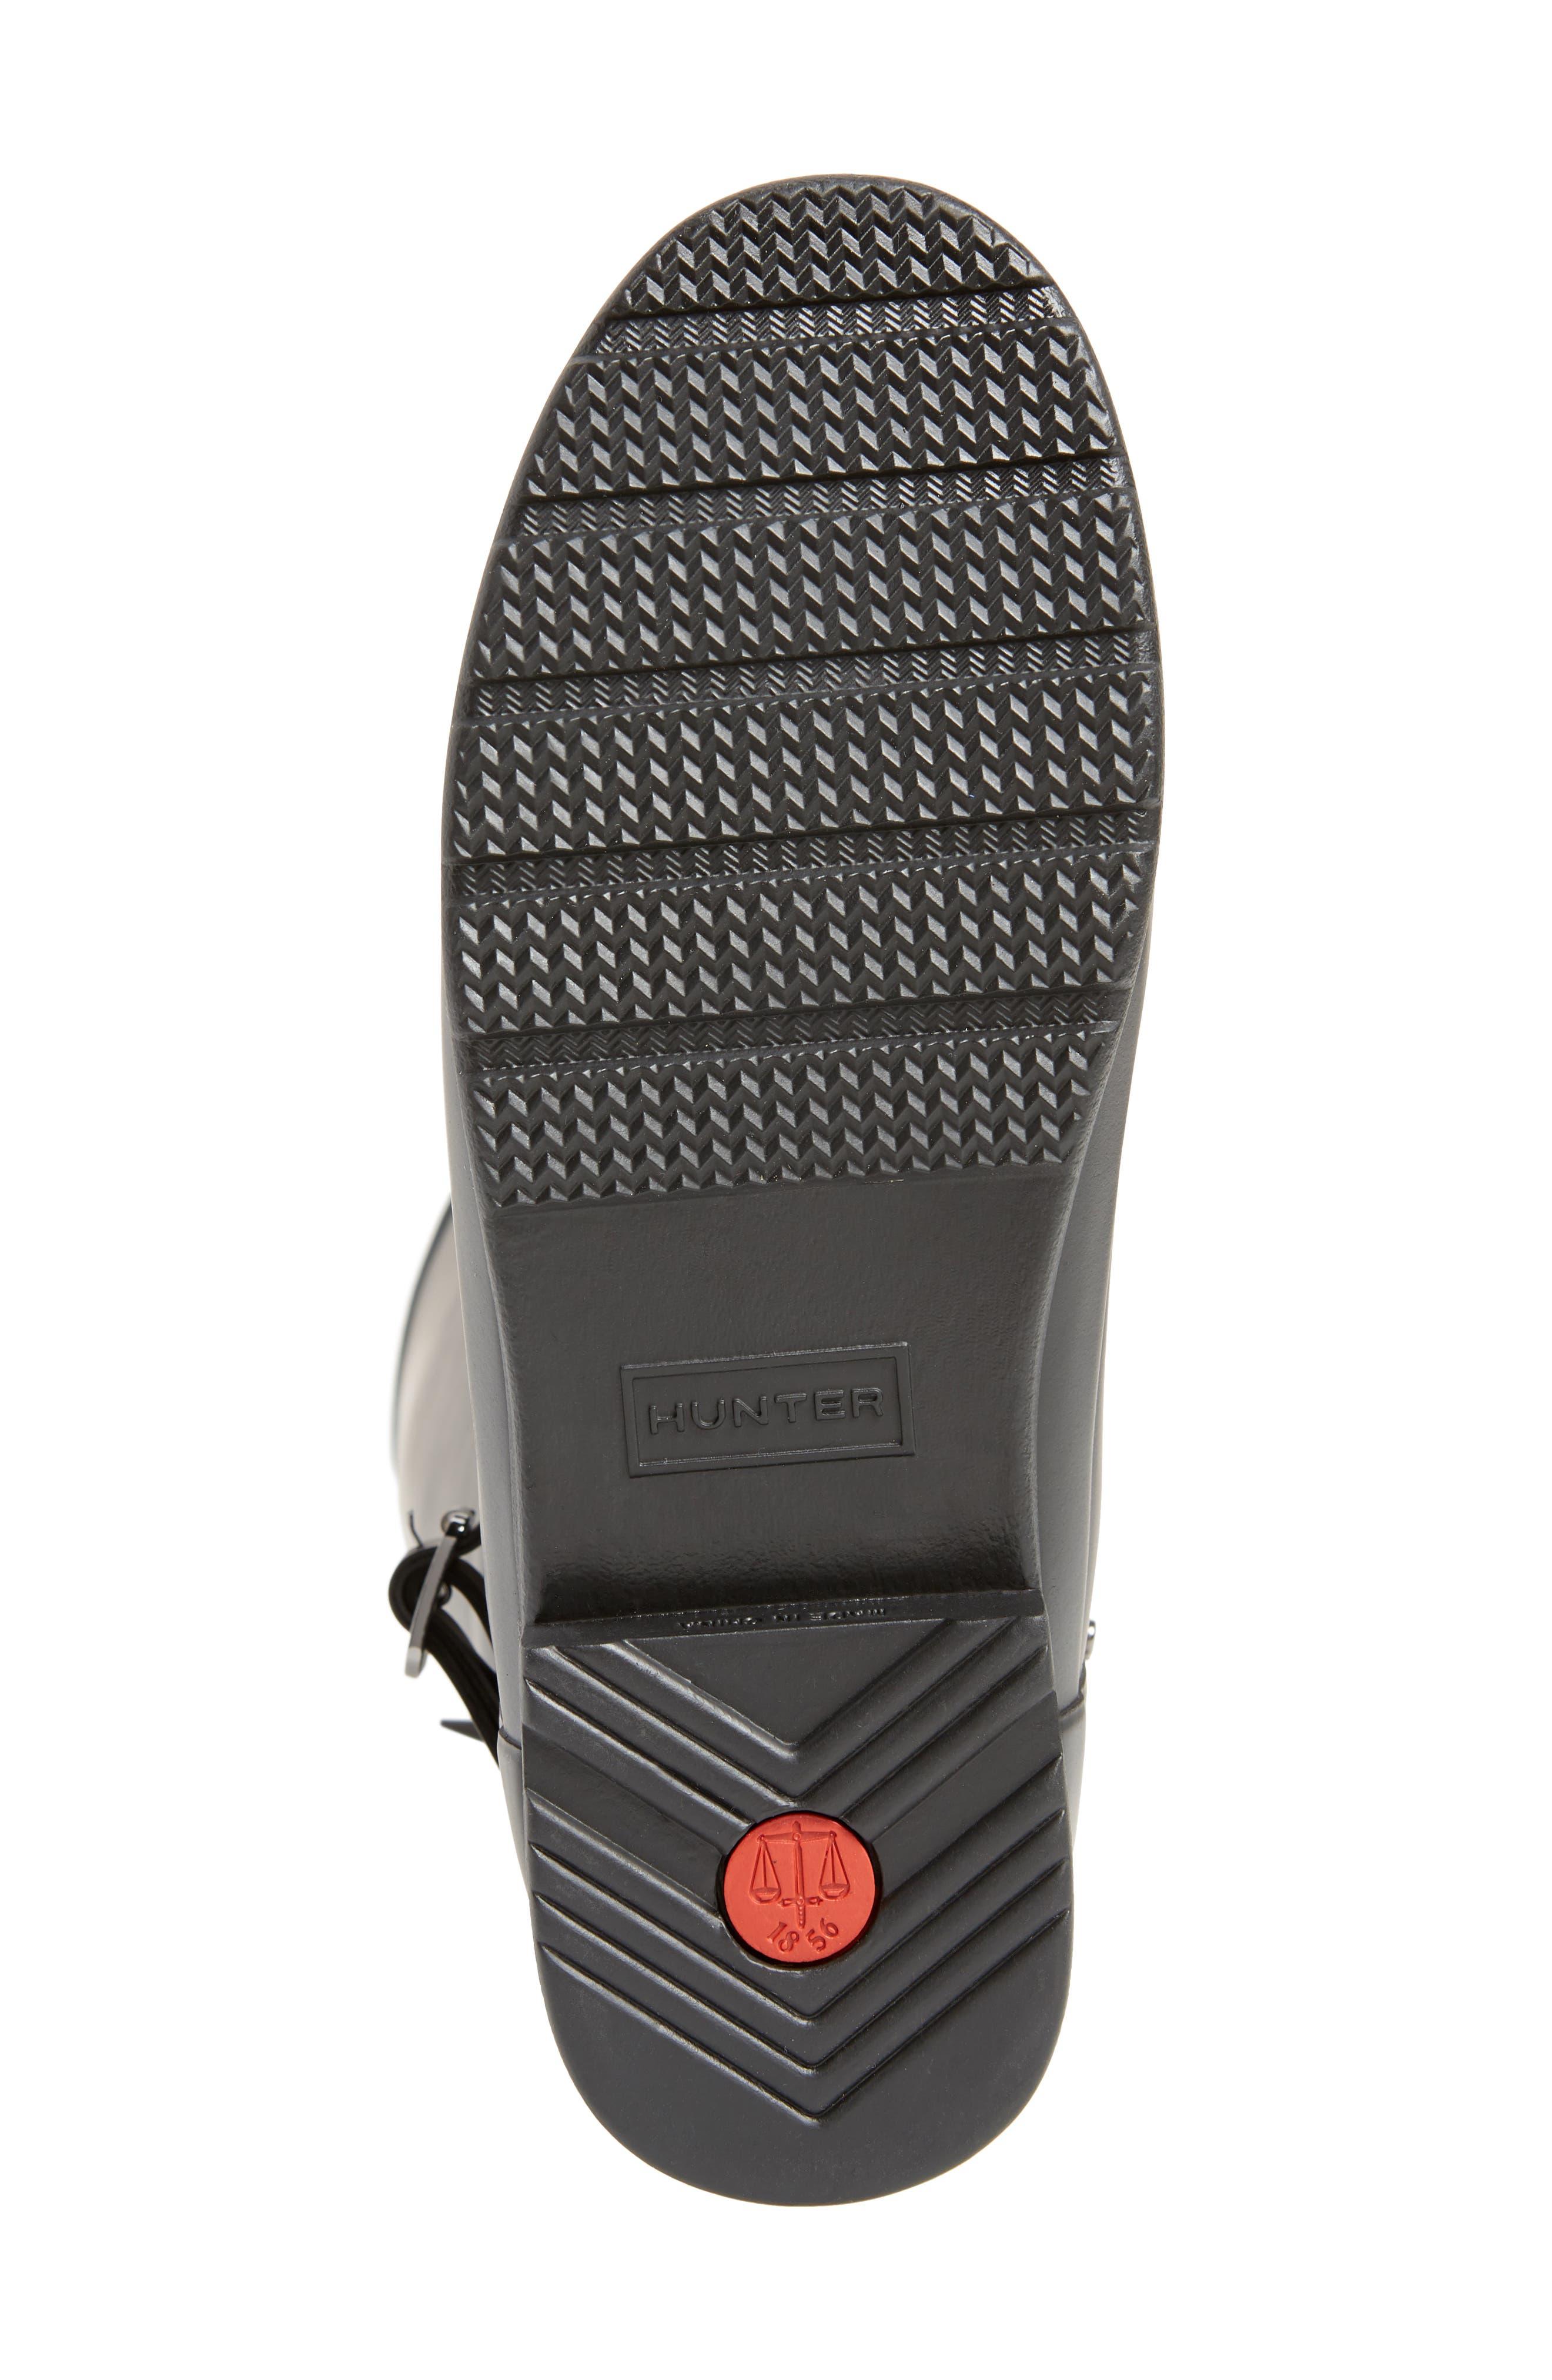 Refined Adjustable Back Knee High Waterproof Rain Boot,                             Alternate thumbnail 6, color,                             BLACK